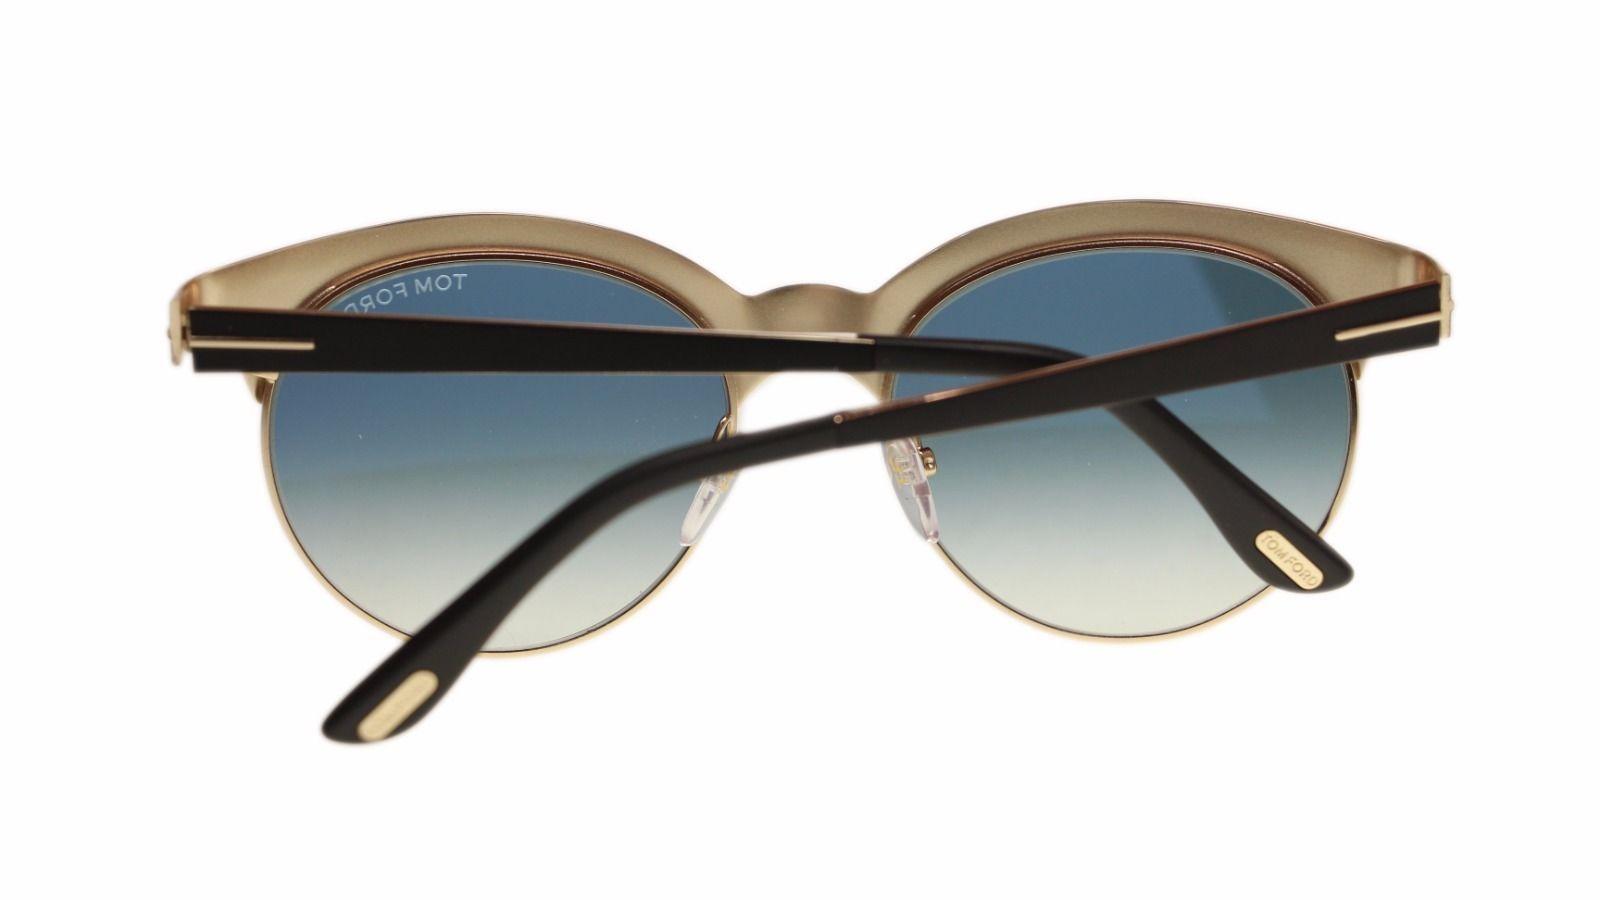 Tom Ford Angela Women's Sunglasses FT0438 05P Black Gold/Blue Grey Round 53mm